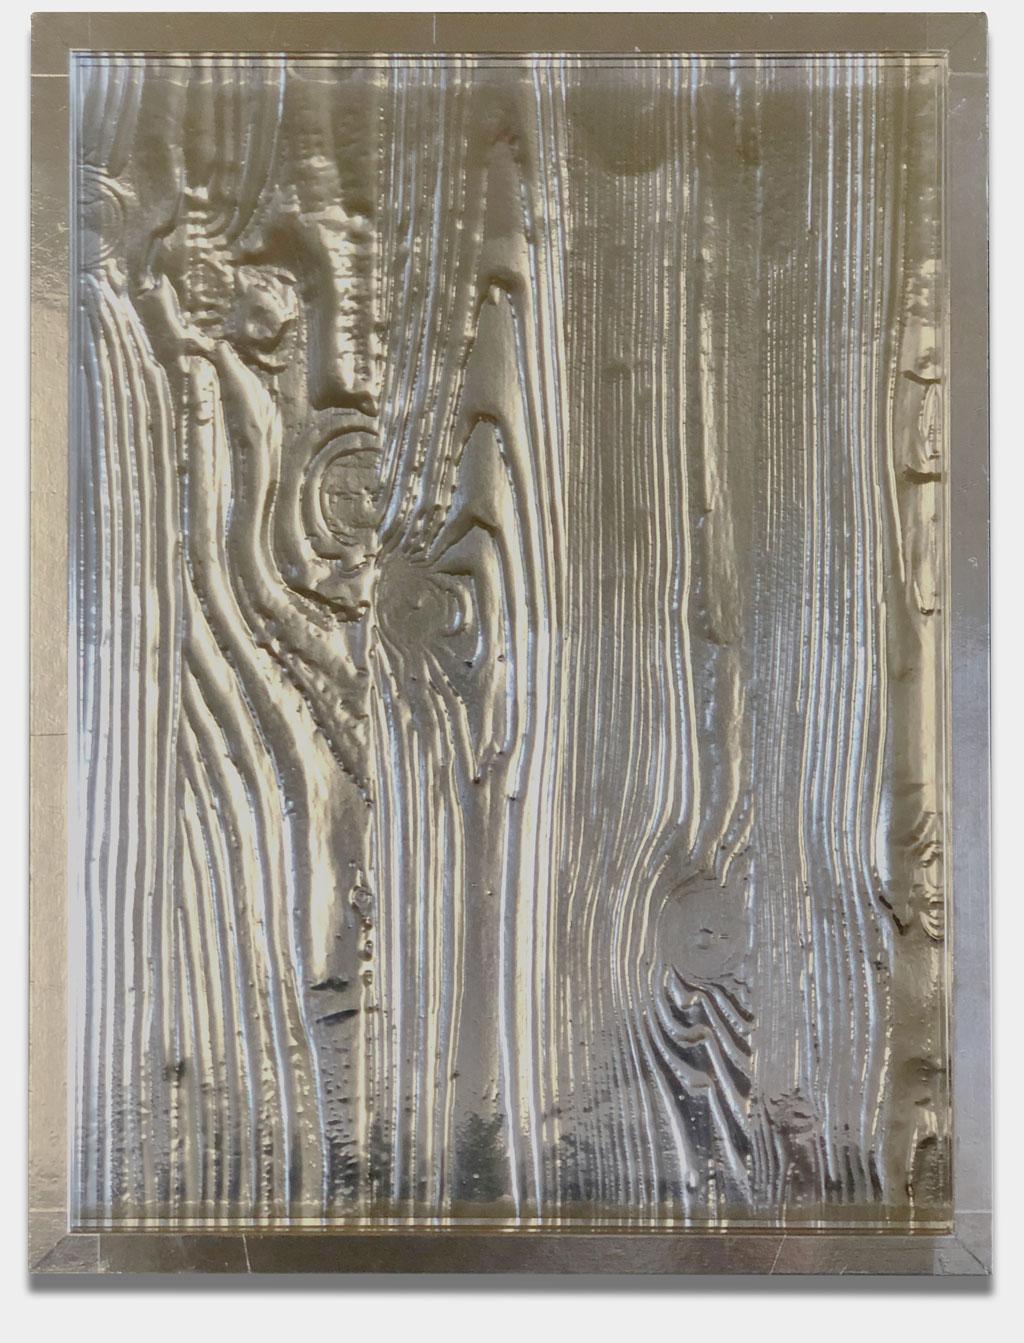 Bergmann, Benjamin, Bildhauer, All in One, 42,2 x 3,3 x 32,2 cm, Aluminium, Holz, Glas, Unikat, 2018